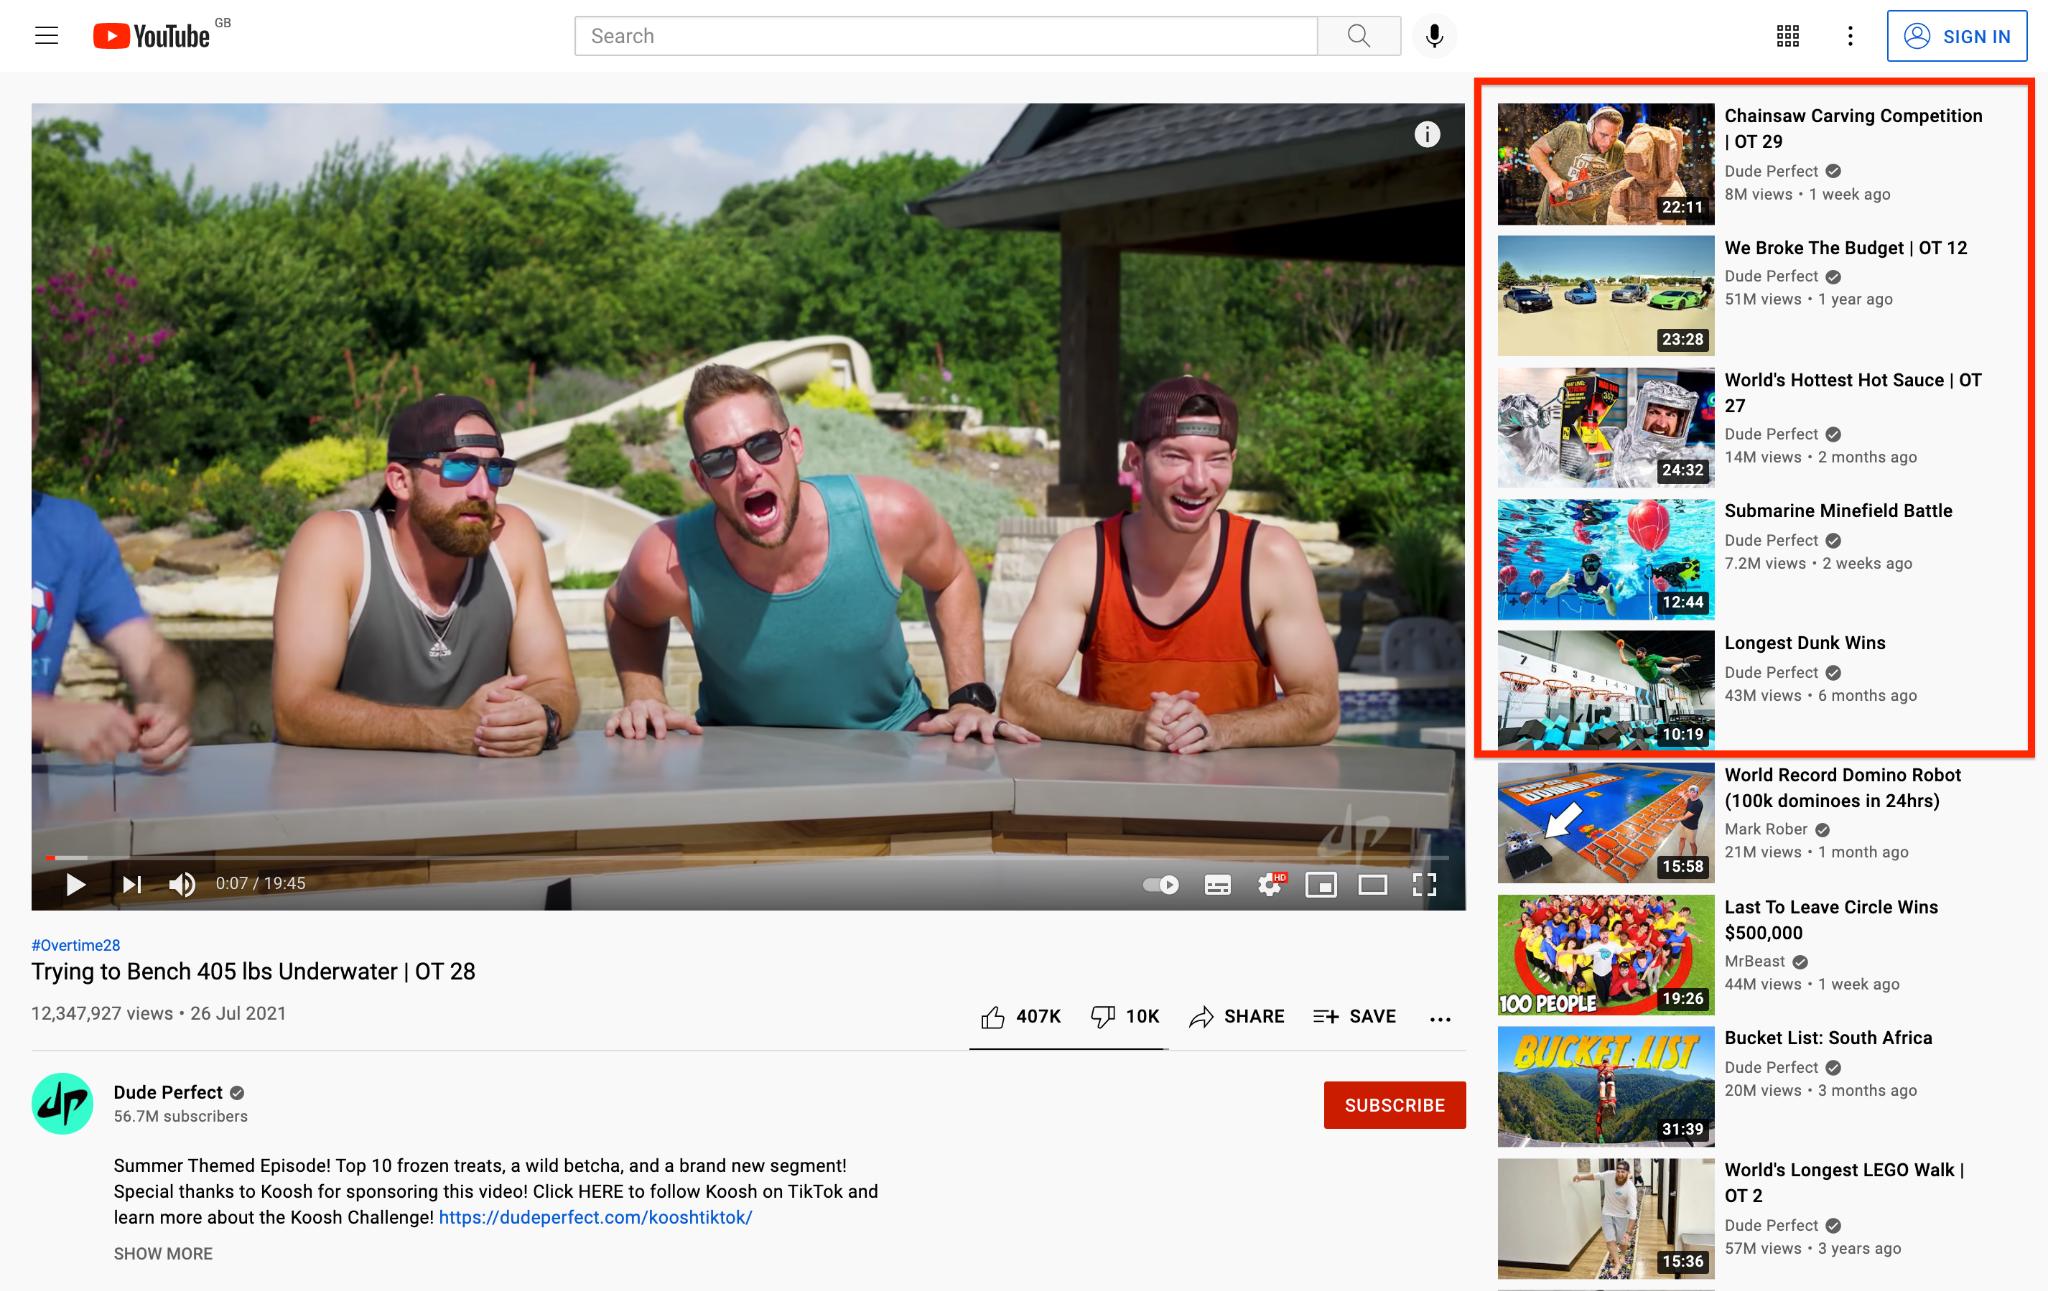 Dude Perfect YouTube Channel screenshot